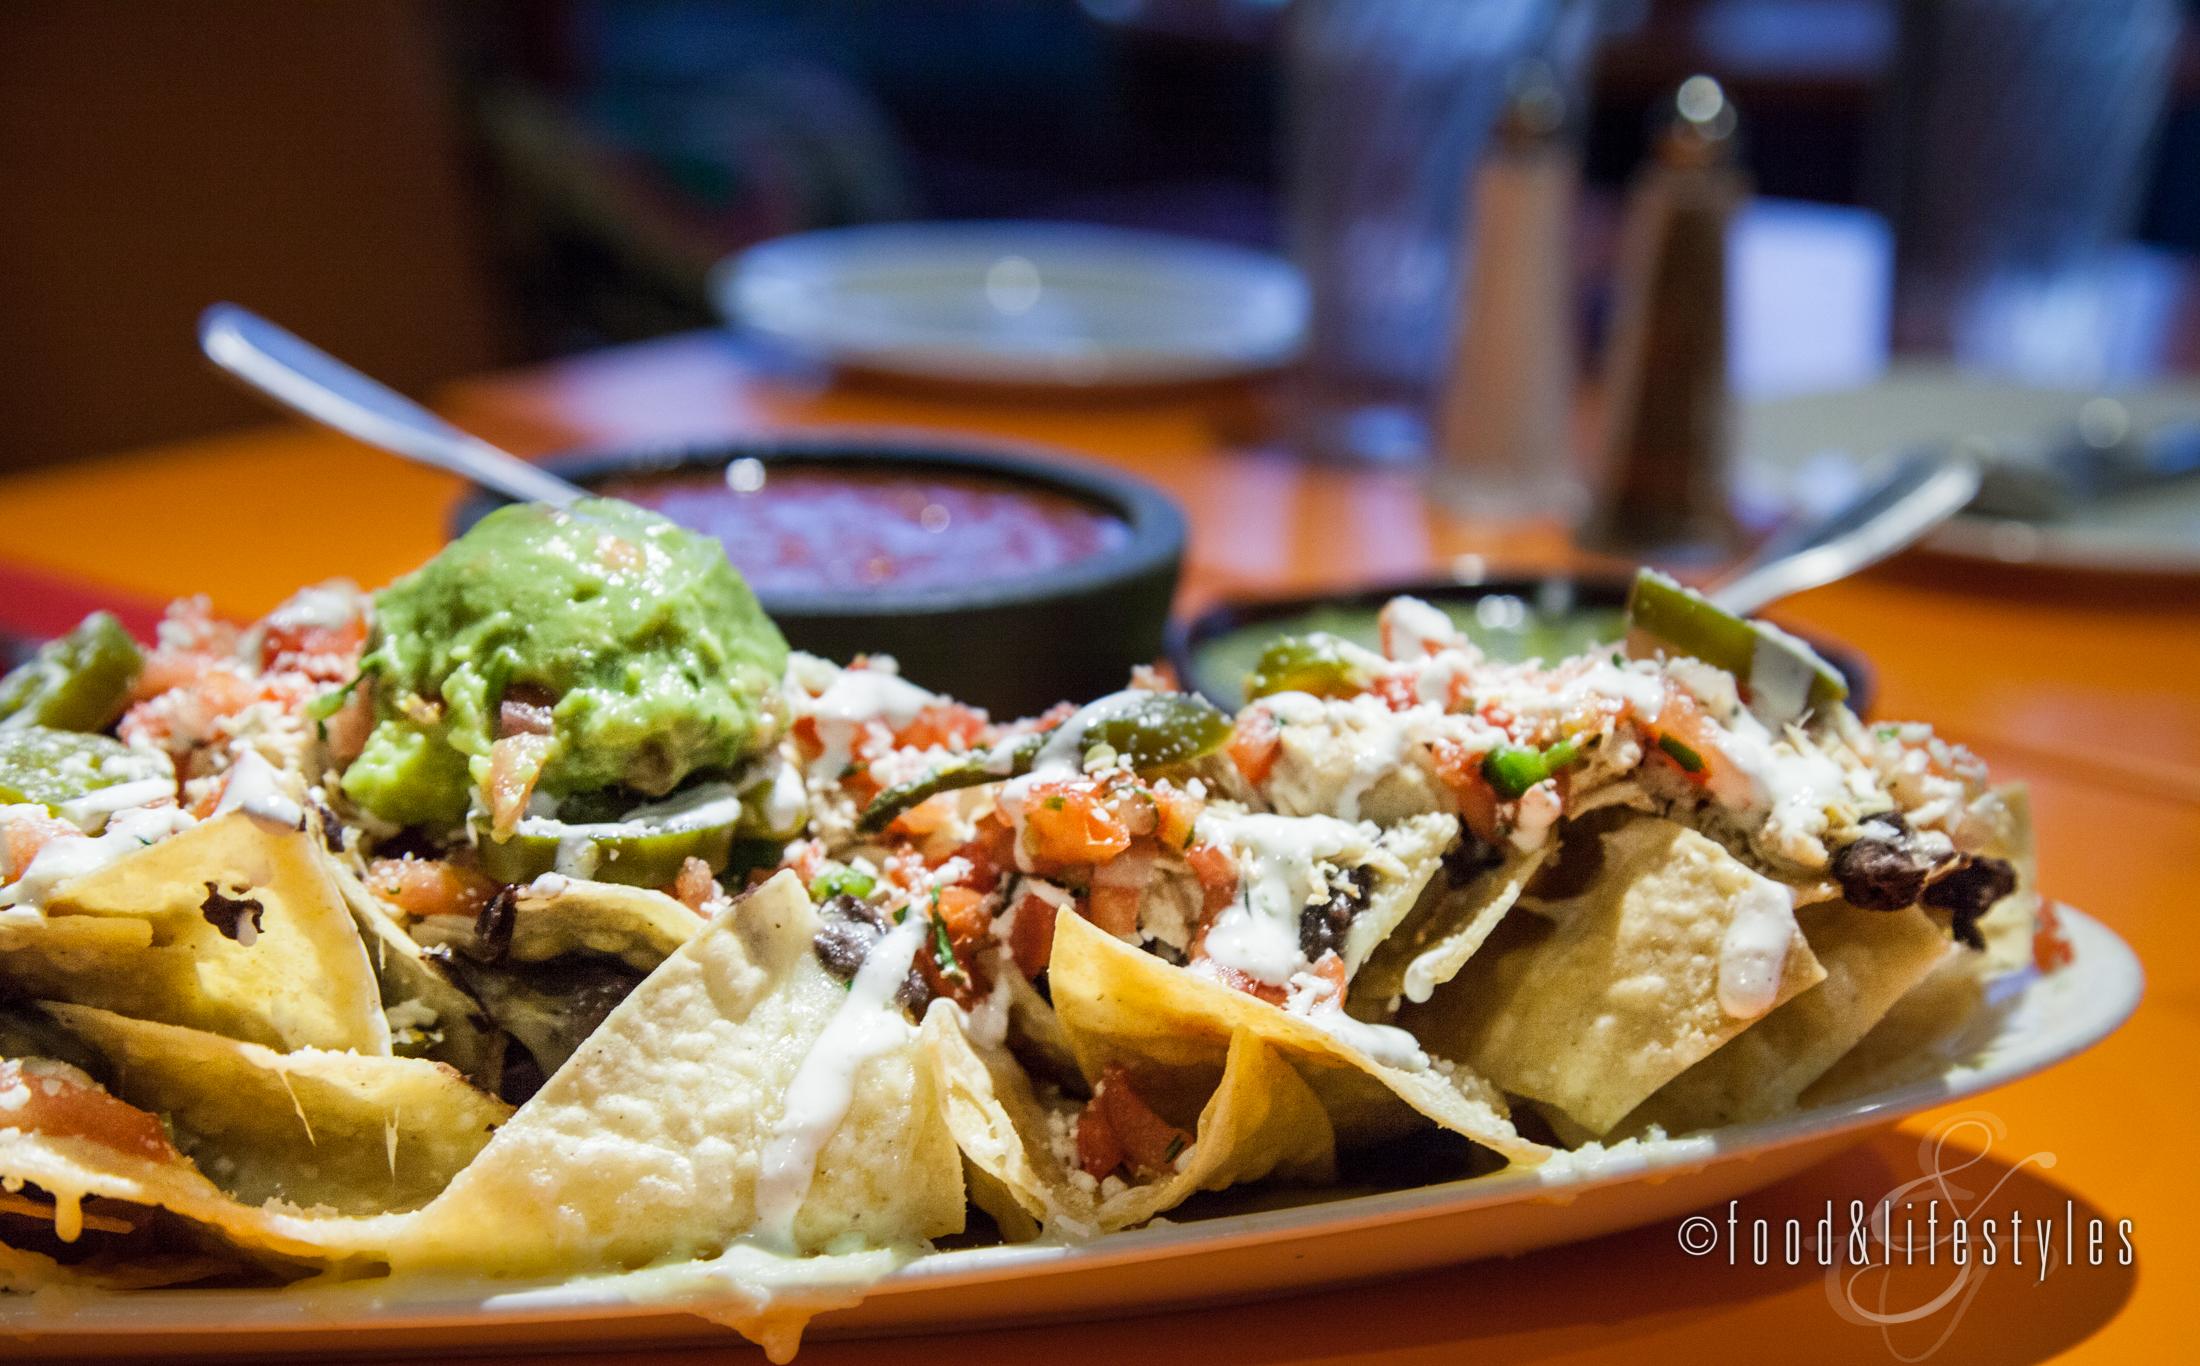 89 Agave nachos